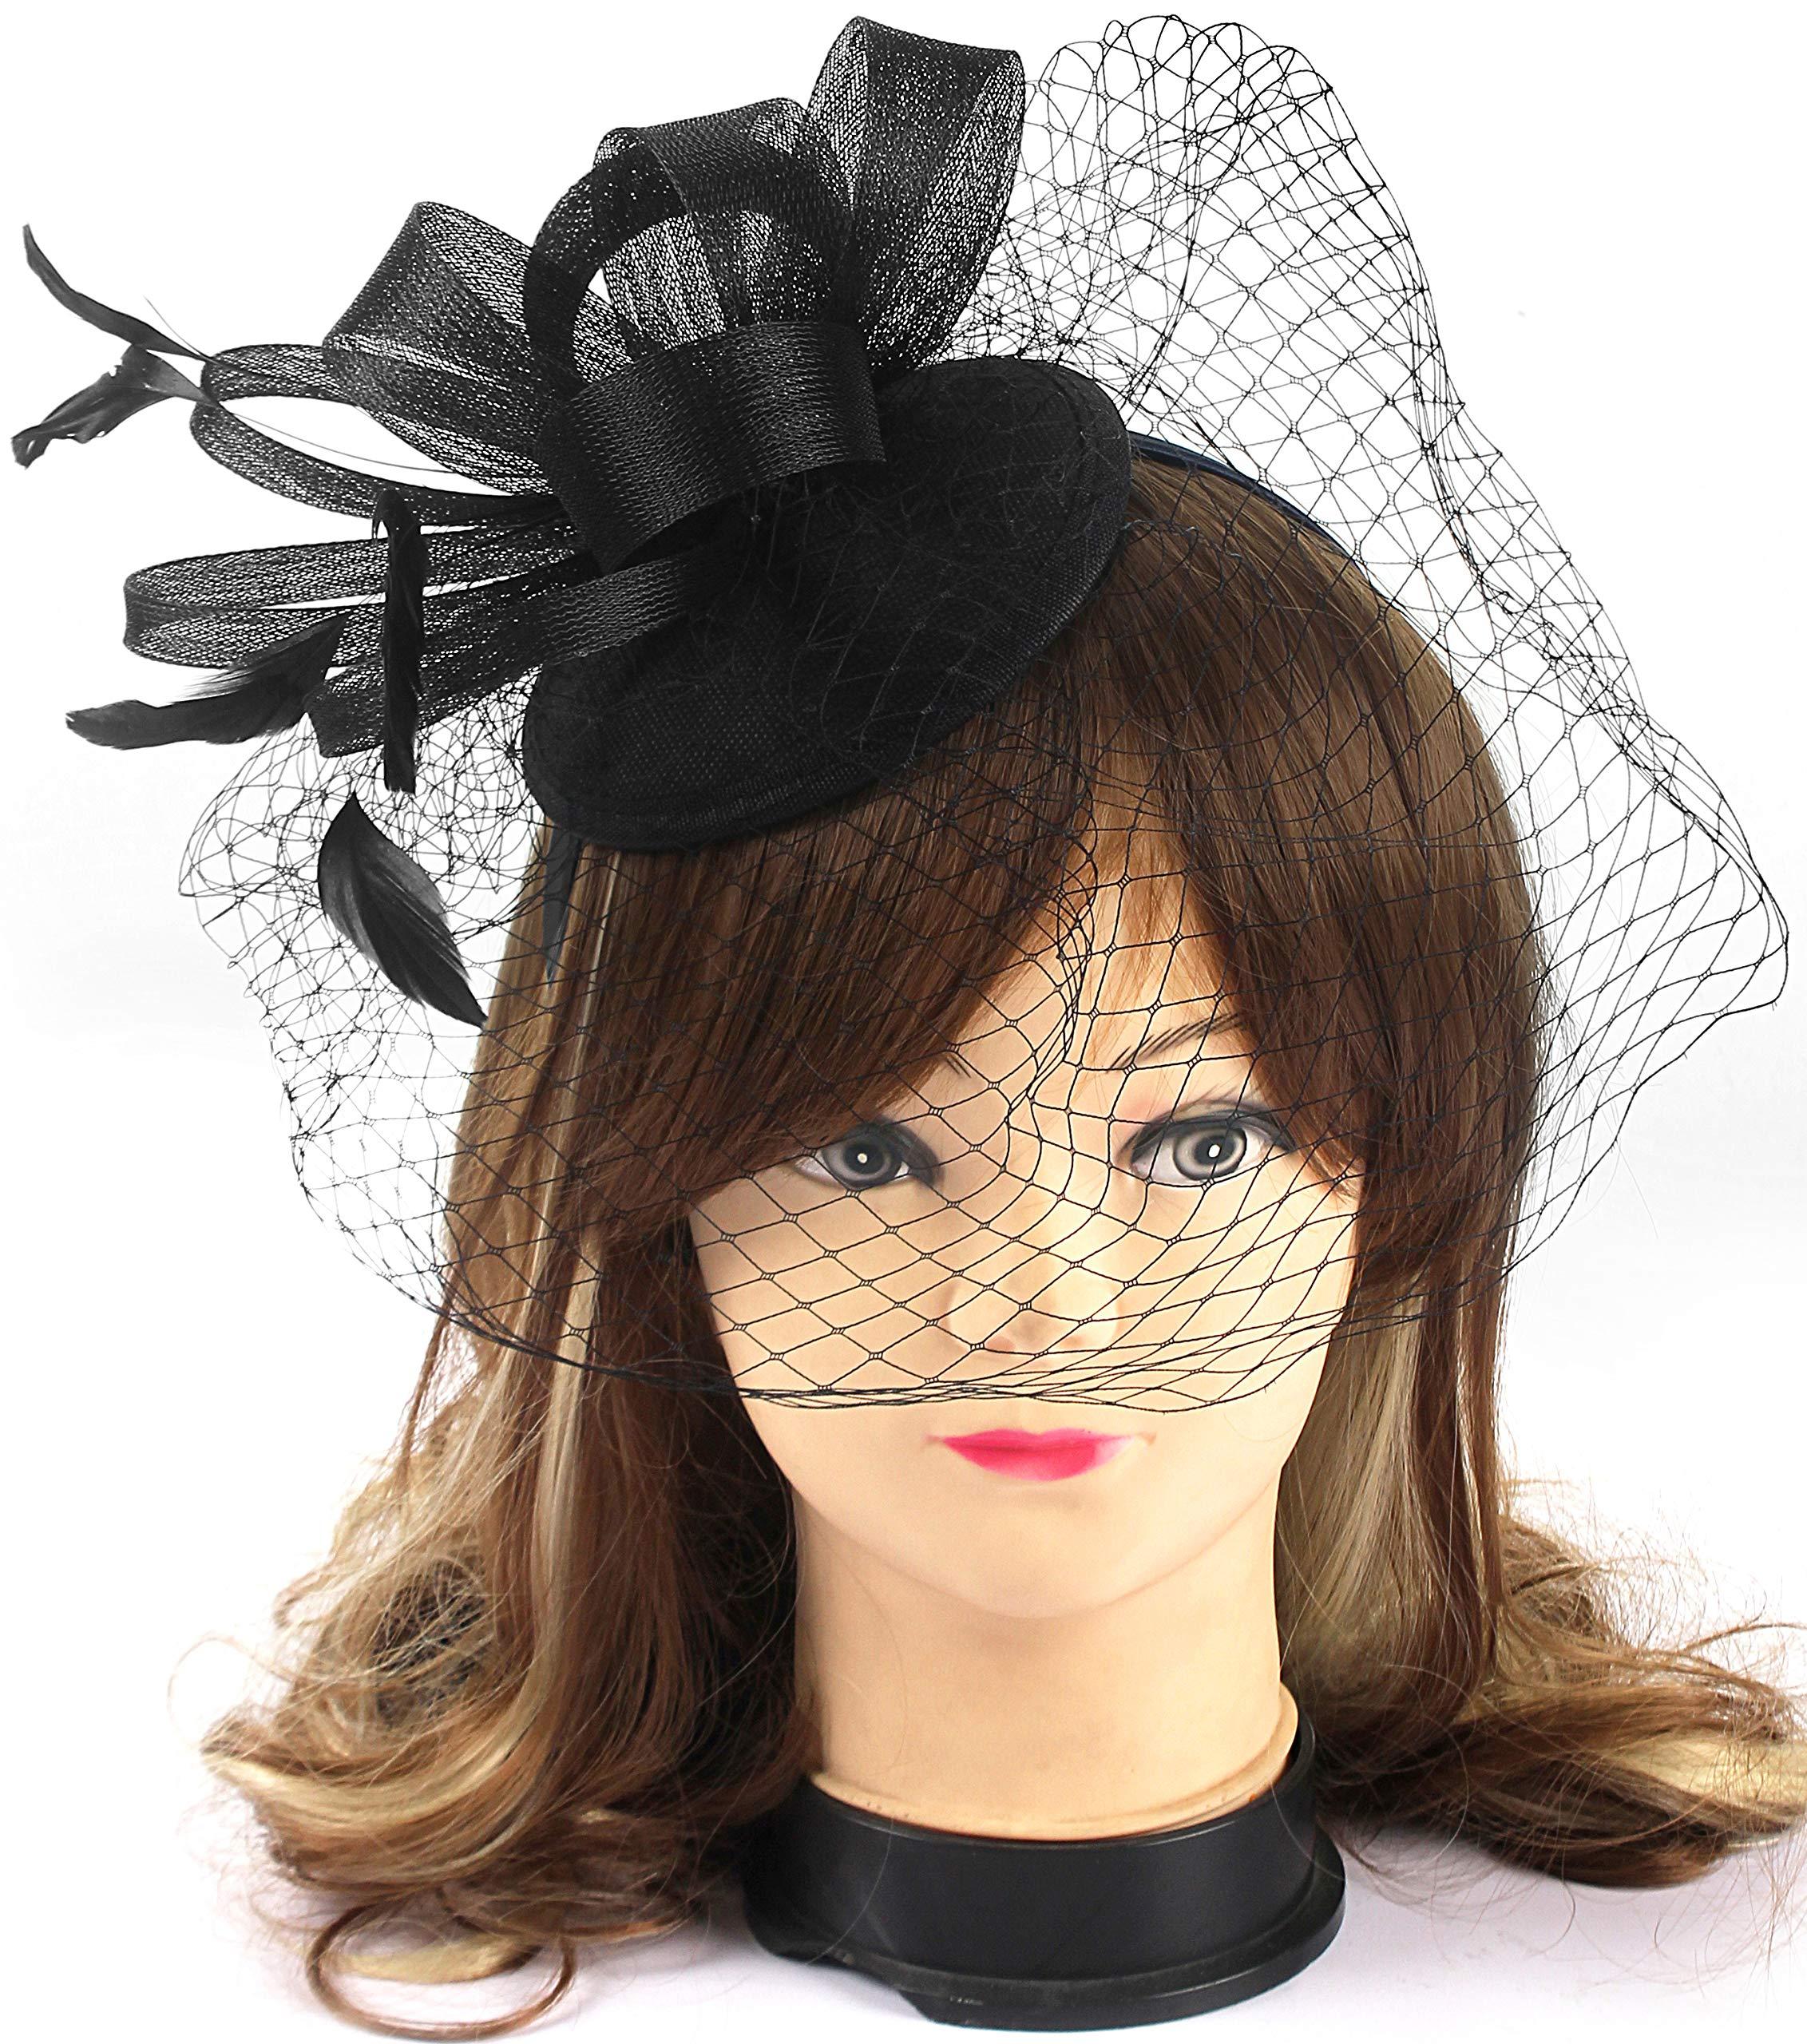 Myjoyday Fascinator Hats Flower Mesh Feather Tea Party Headband Wedding Cocktail Clip Headwear for Girls and Women (Black)